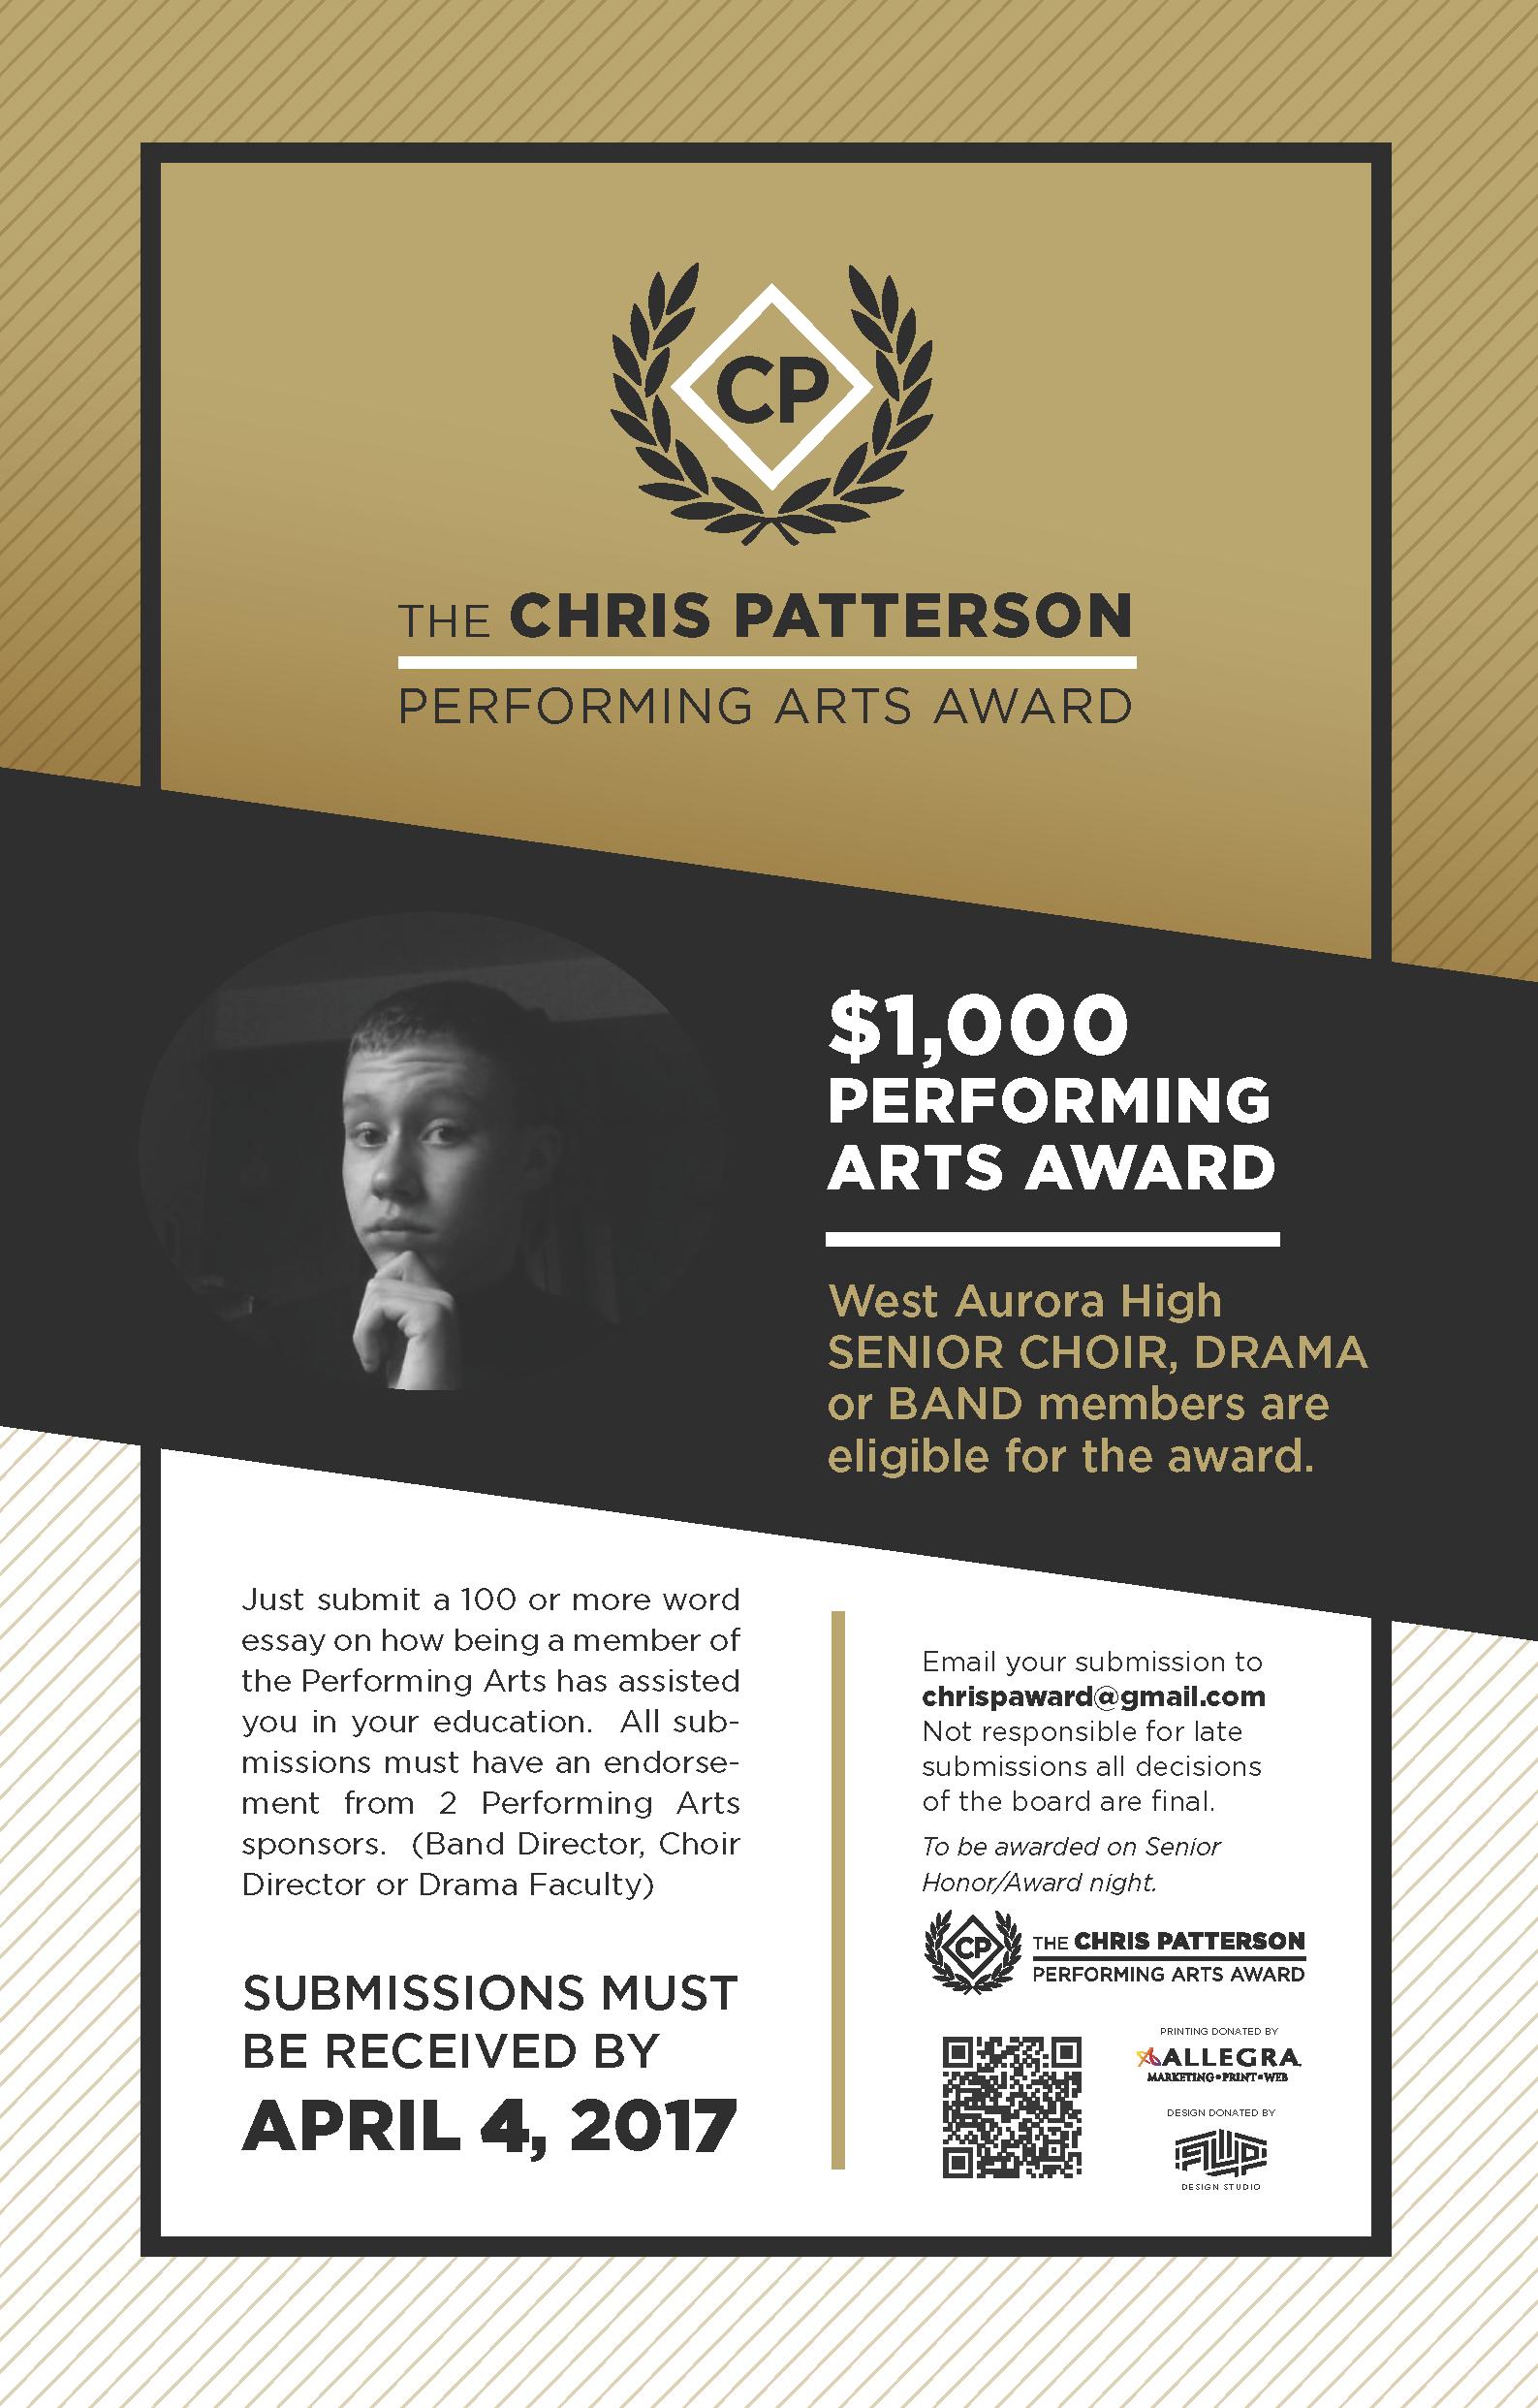 chrispatterson-performing-arts-award-poster-2017-to-print